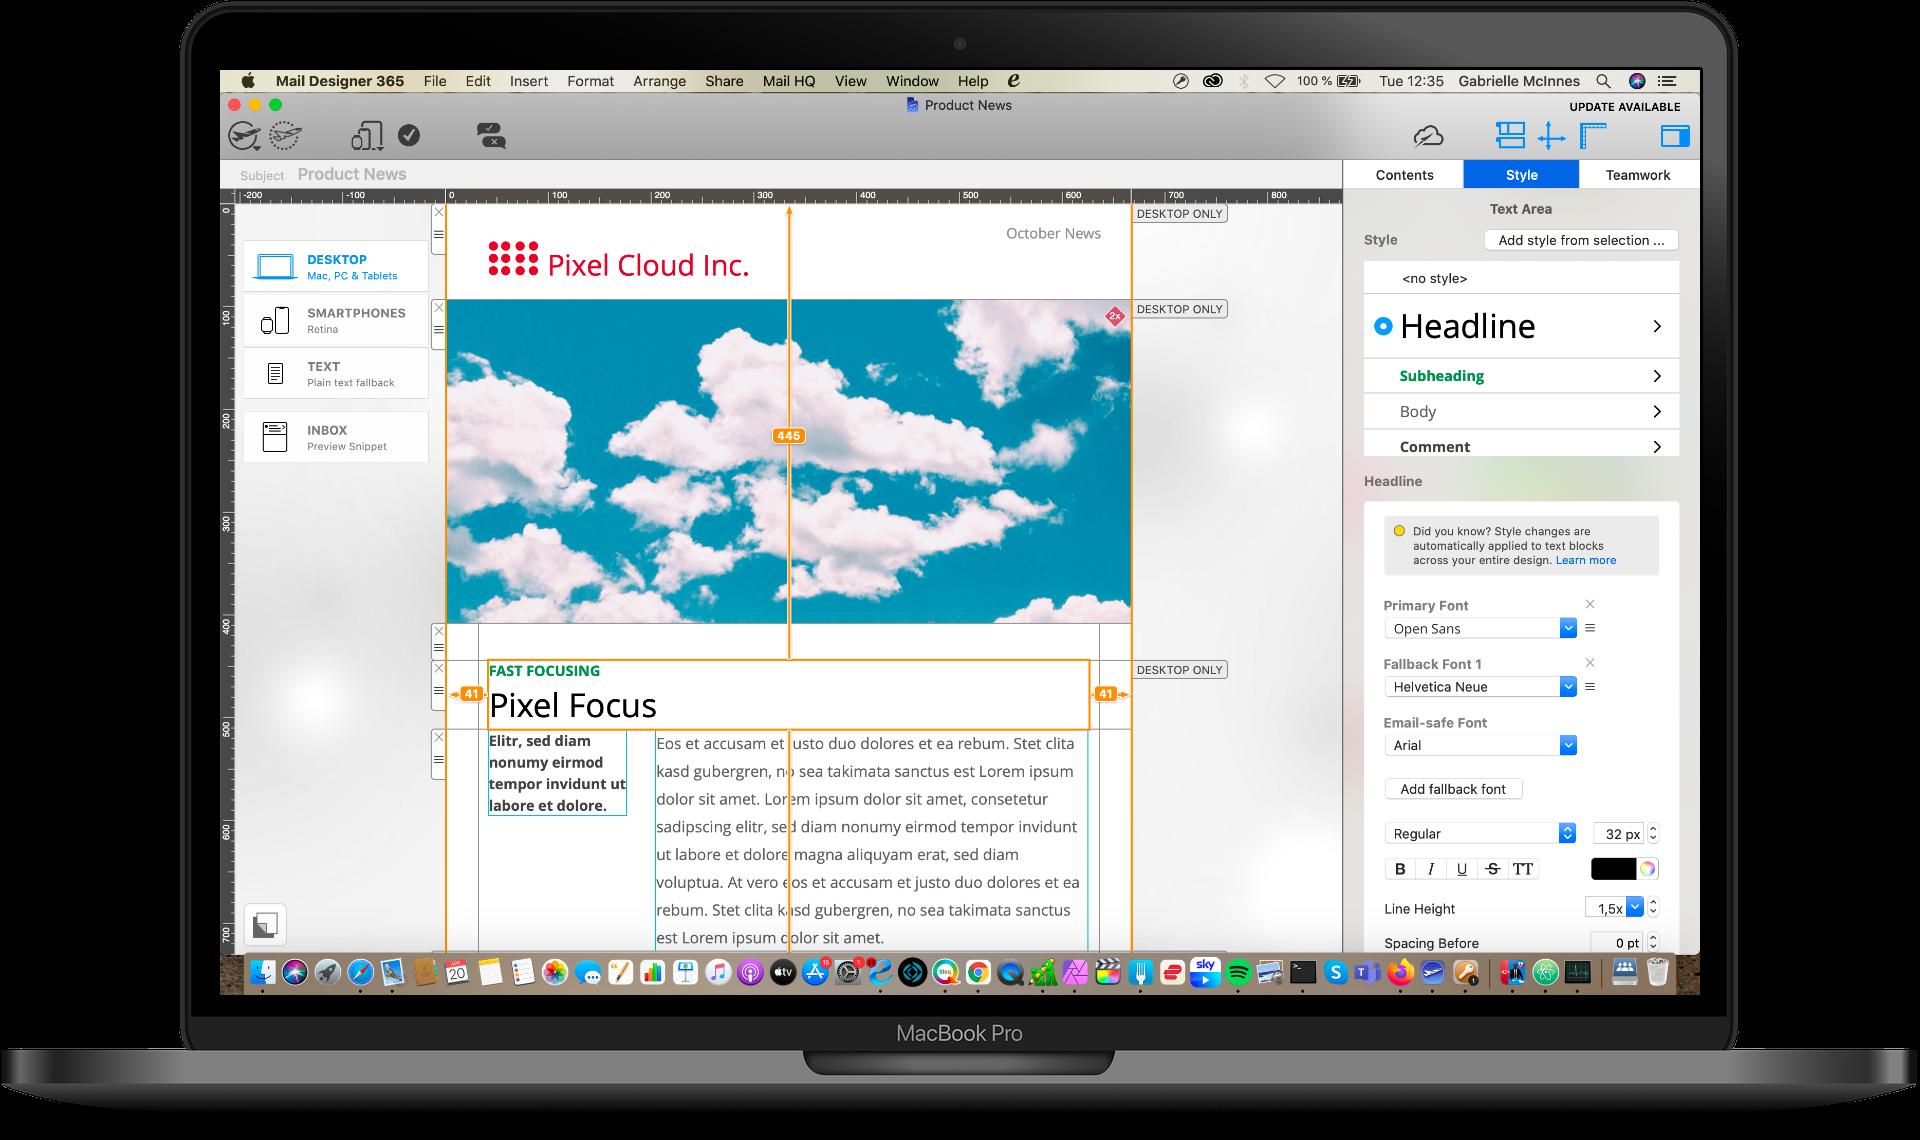 product newsletter email design in mail designer 365